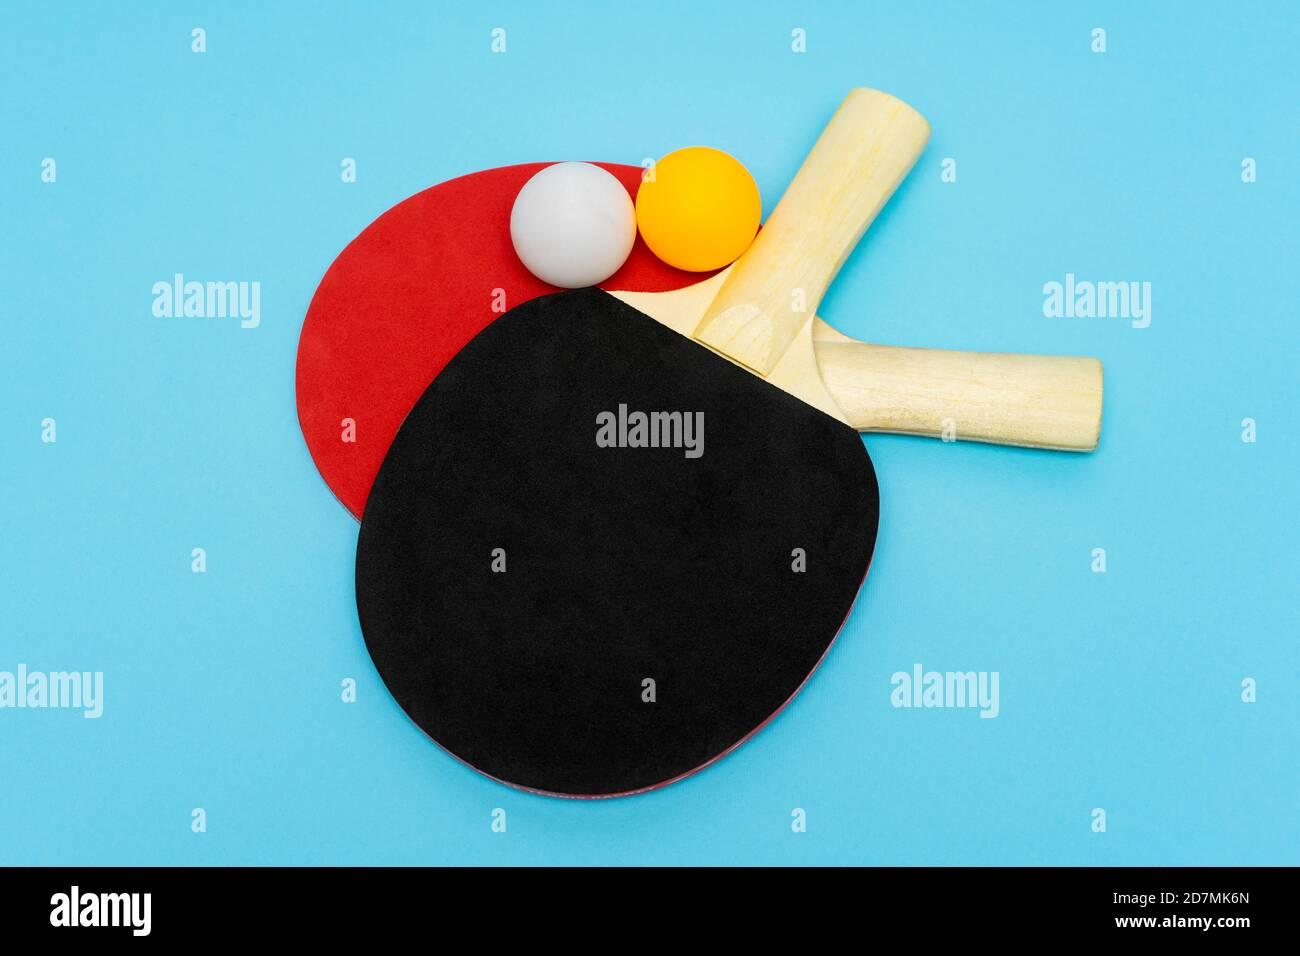 Table Tennis Ping Pong Set  Bats And Balls Set Stock Photo